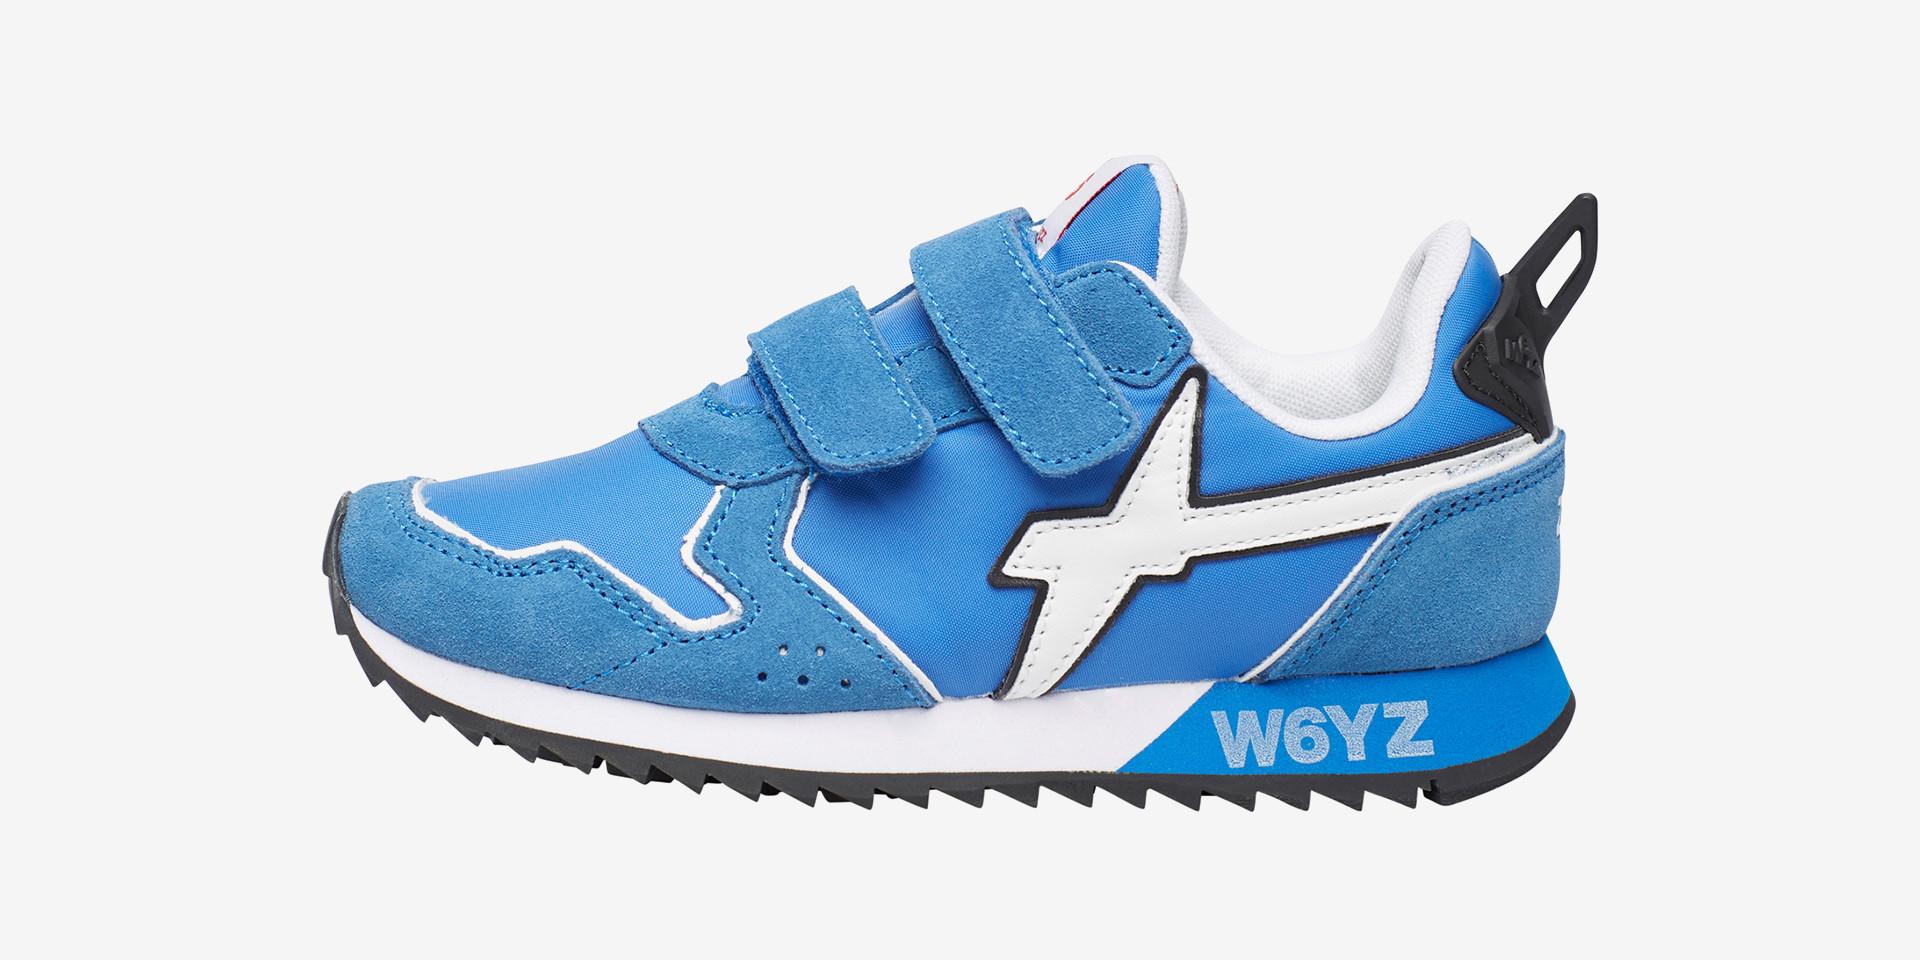 JET VL-J - Sneaker in tessuto e suede - Azzurro-Bianco